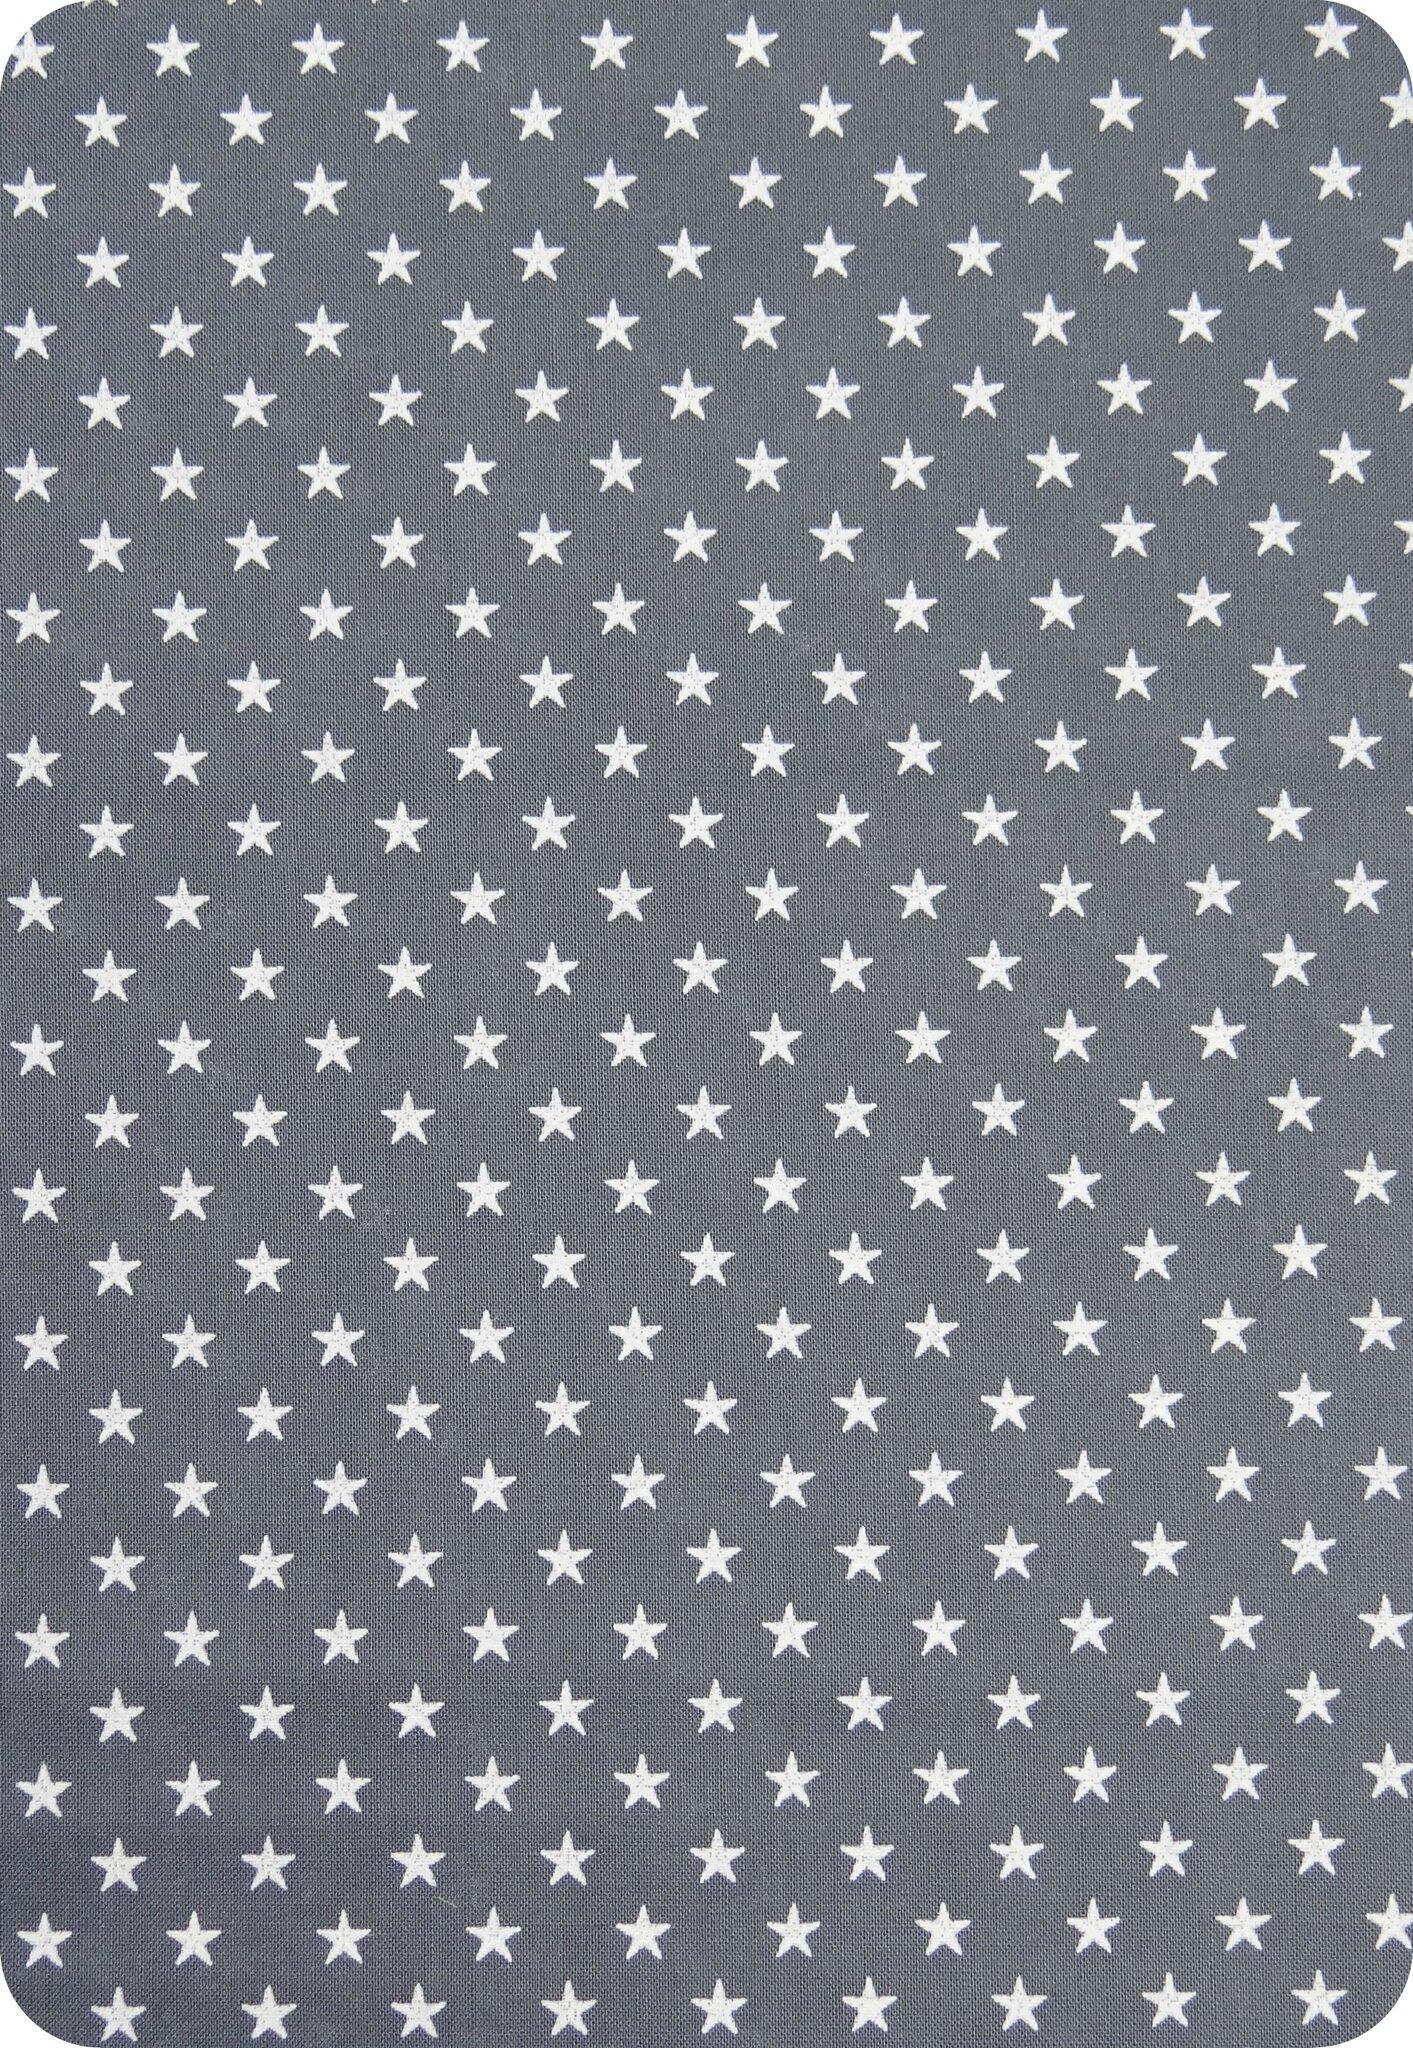 Tissu France Duval gris étoiles blanches